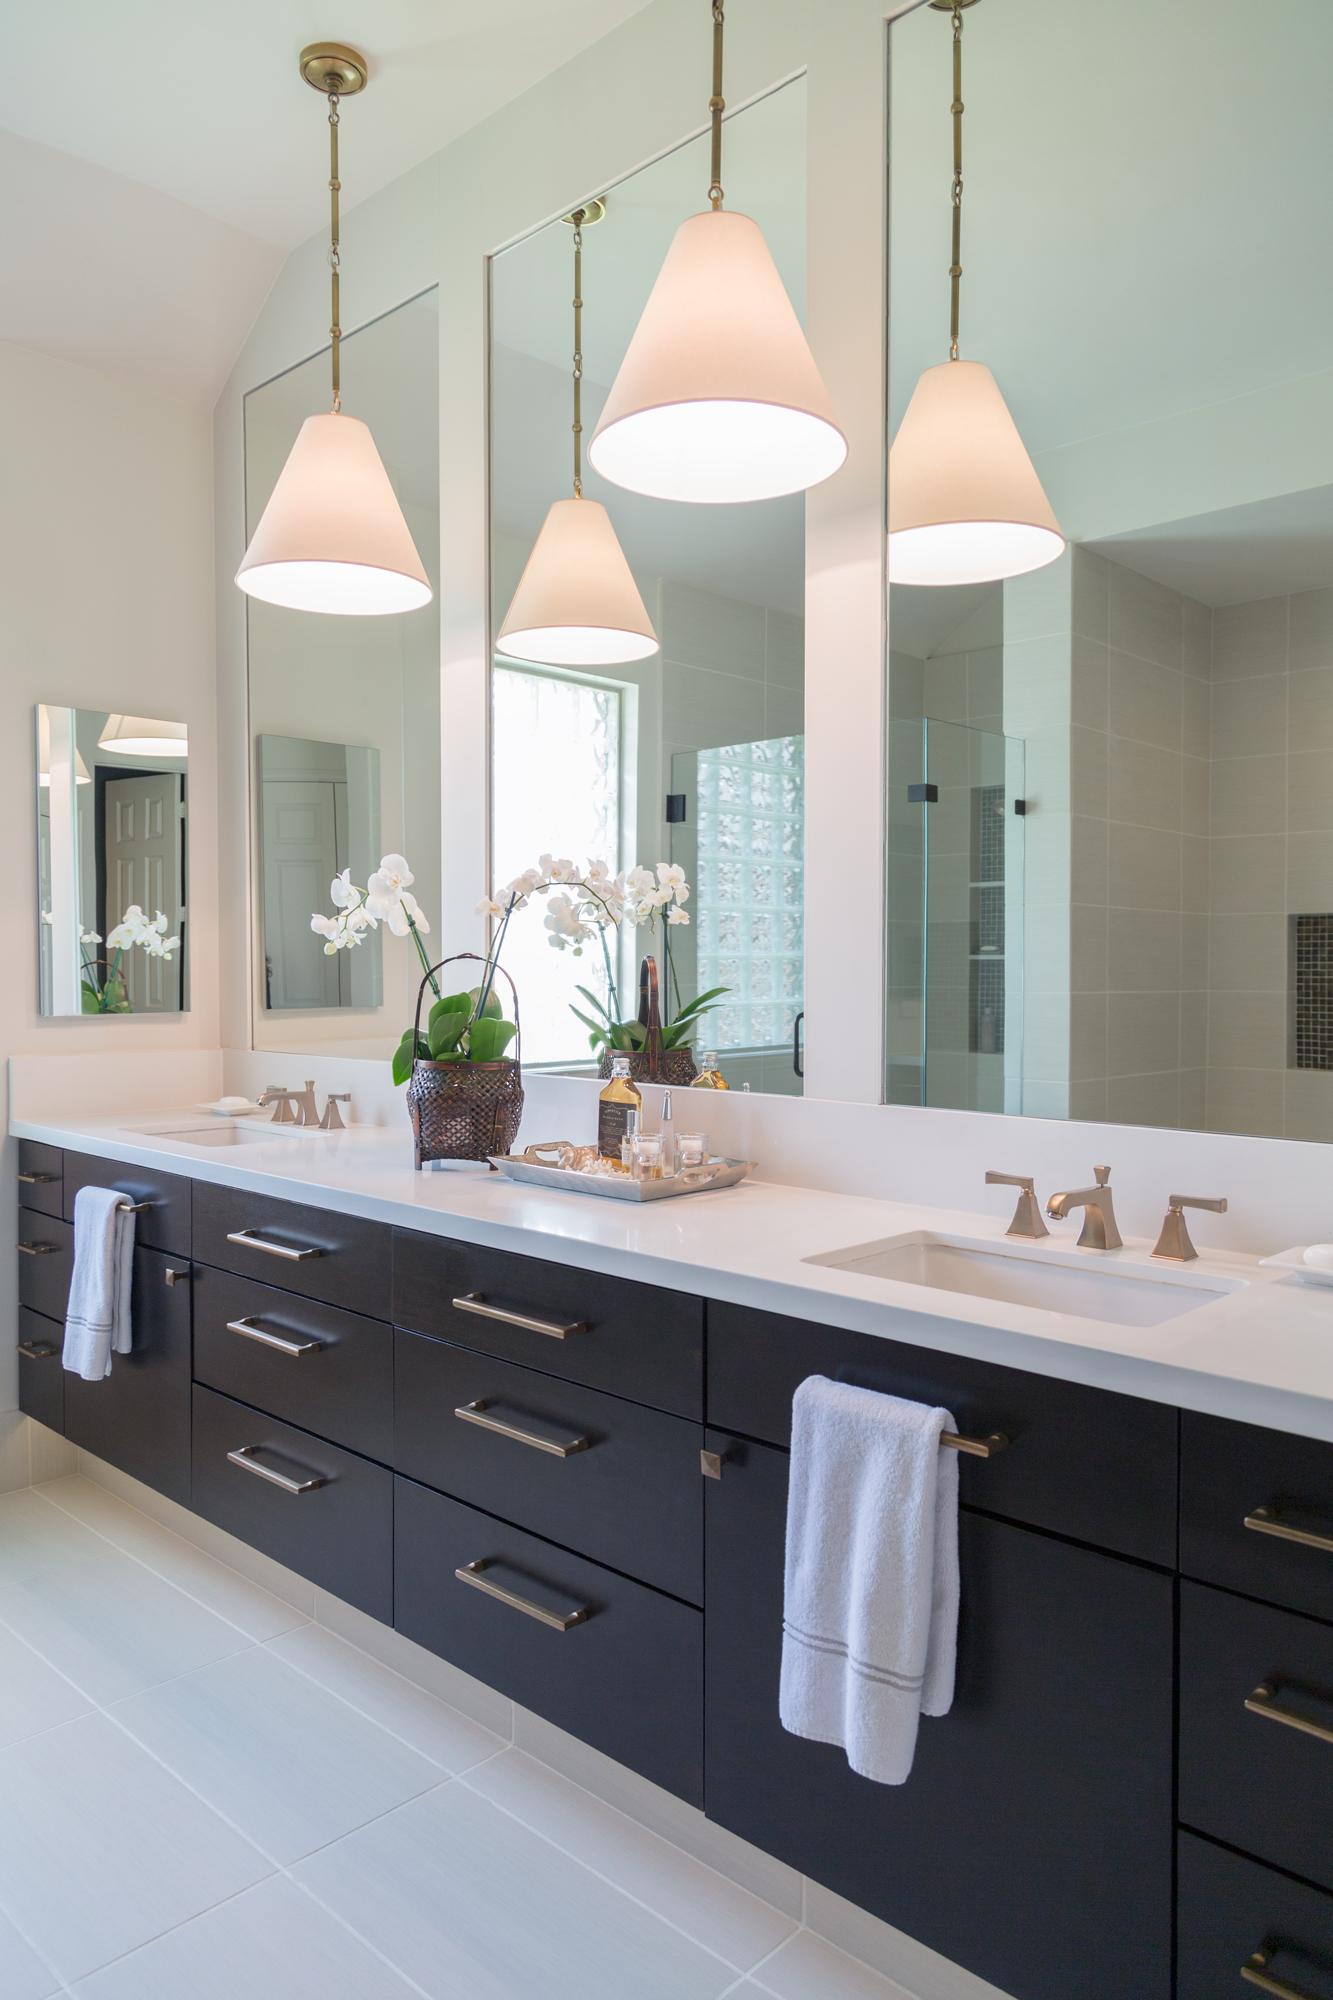 Bathroom vanity with tall mirrors | Designer: Carla Aston, Photographer: Tori Aston